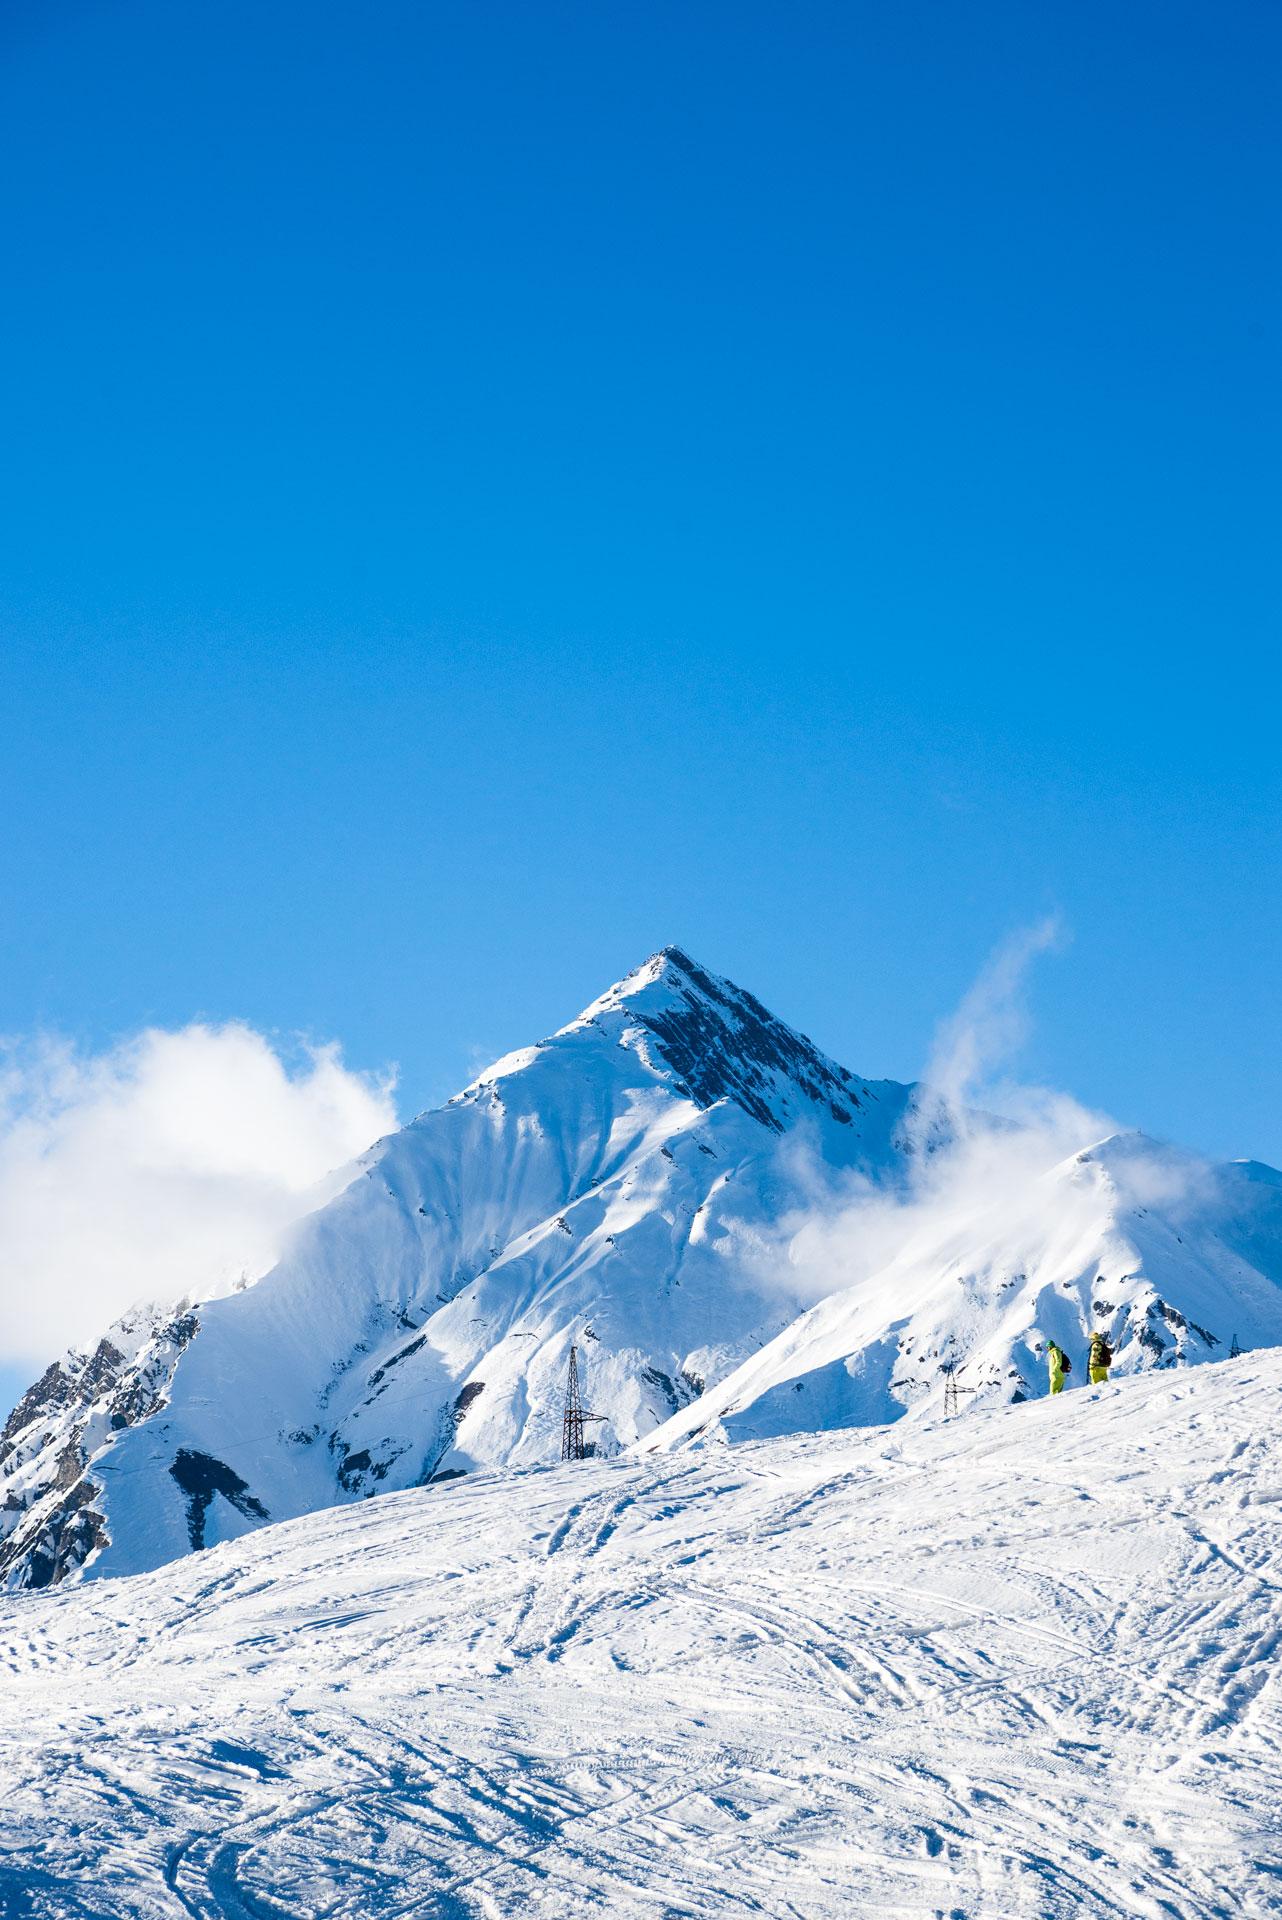 Two skiers walking close to one of the peaks in Gudauri.